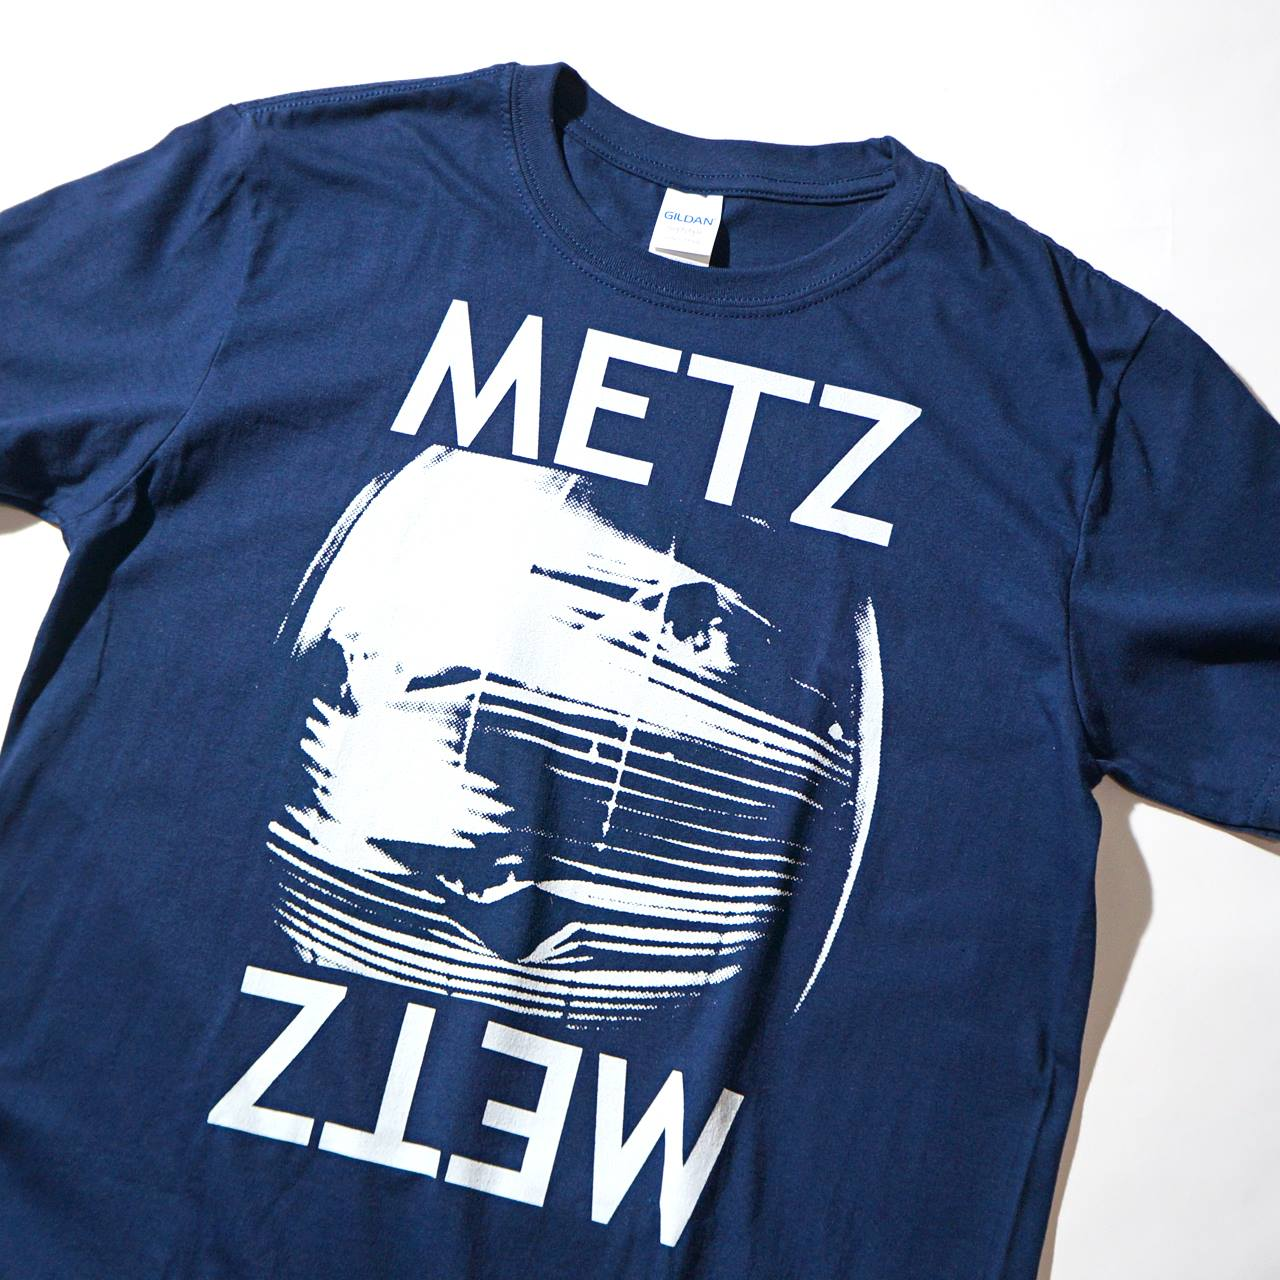 METZ (メッツ) バンド Tシャツ Blind-Navy